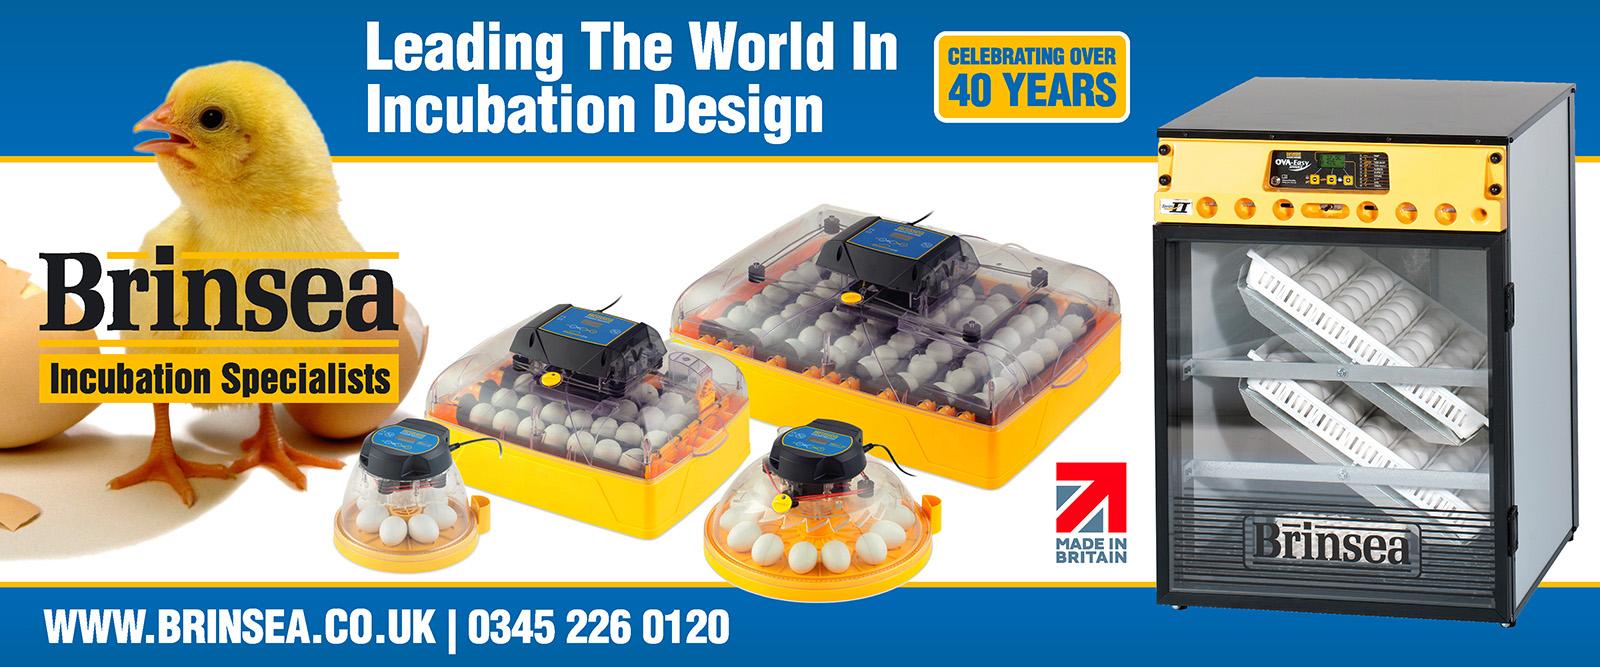 Brinsea incubator specialists